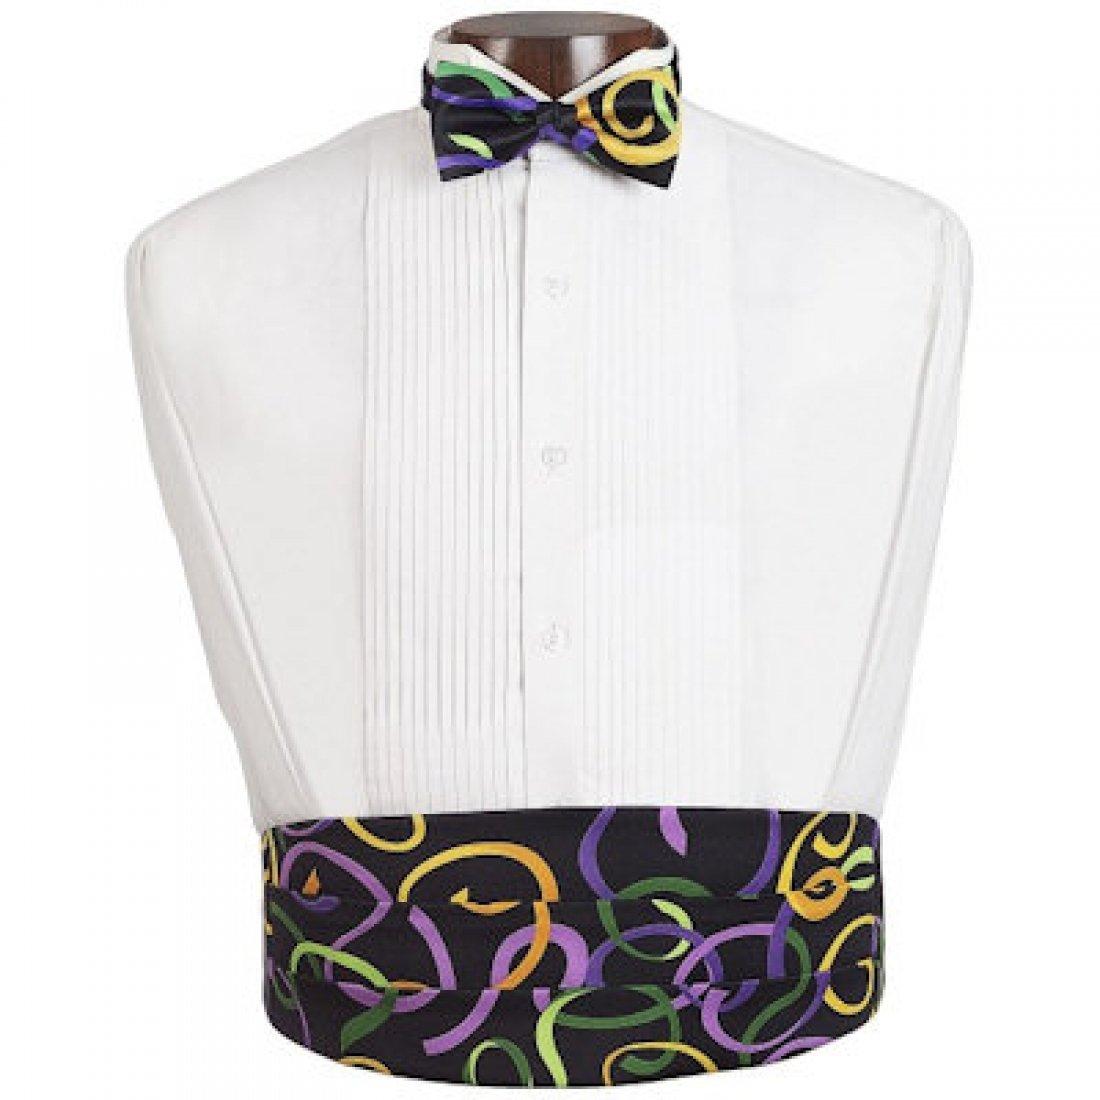 Mardi Gras Fat Tuesday Tuxedo Cummerbund and Bow Tie 9000